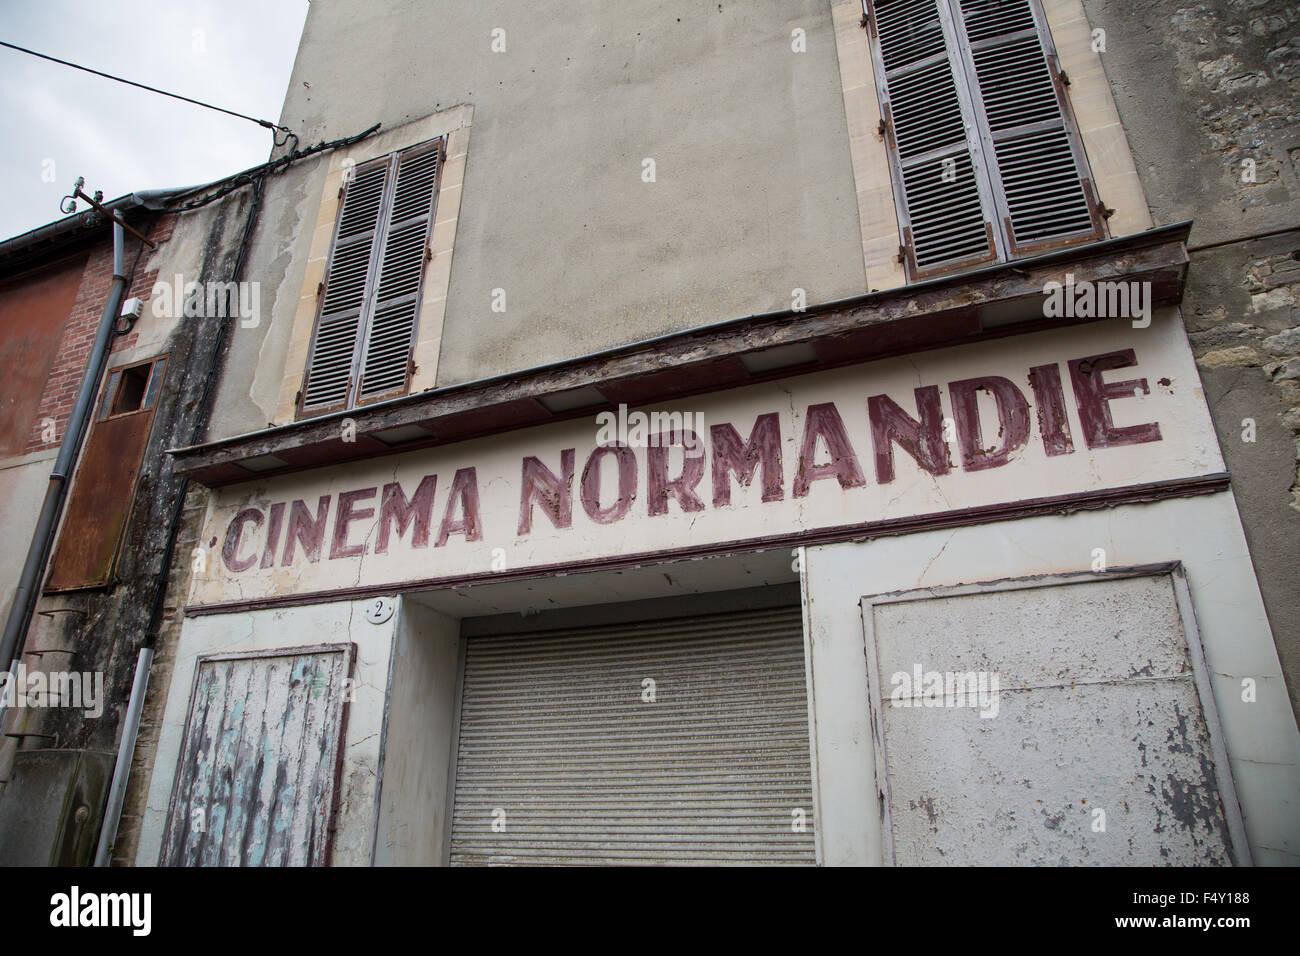 Bayeux Street Normandy Stock Photos & Bayeux Street Normandy Stock ...